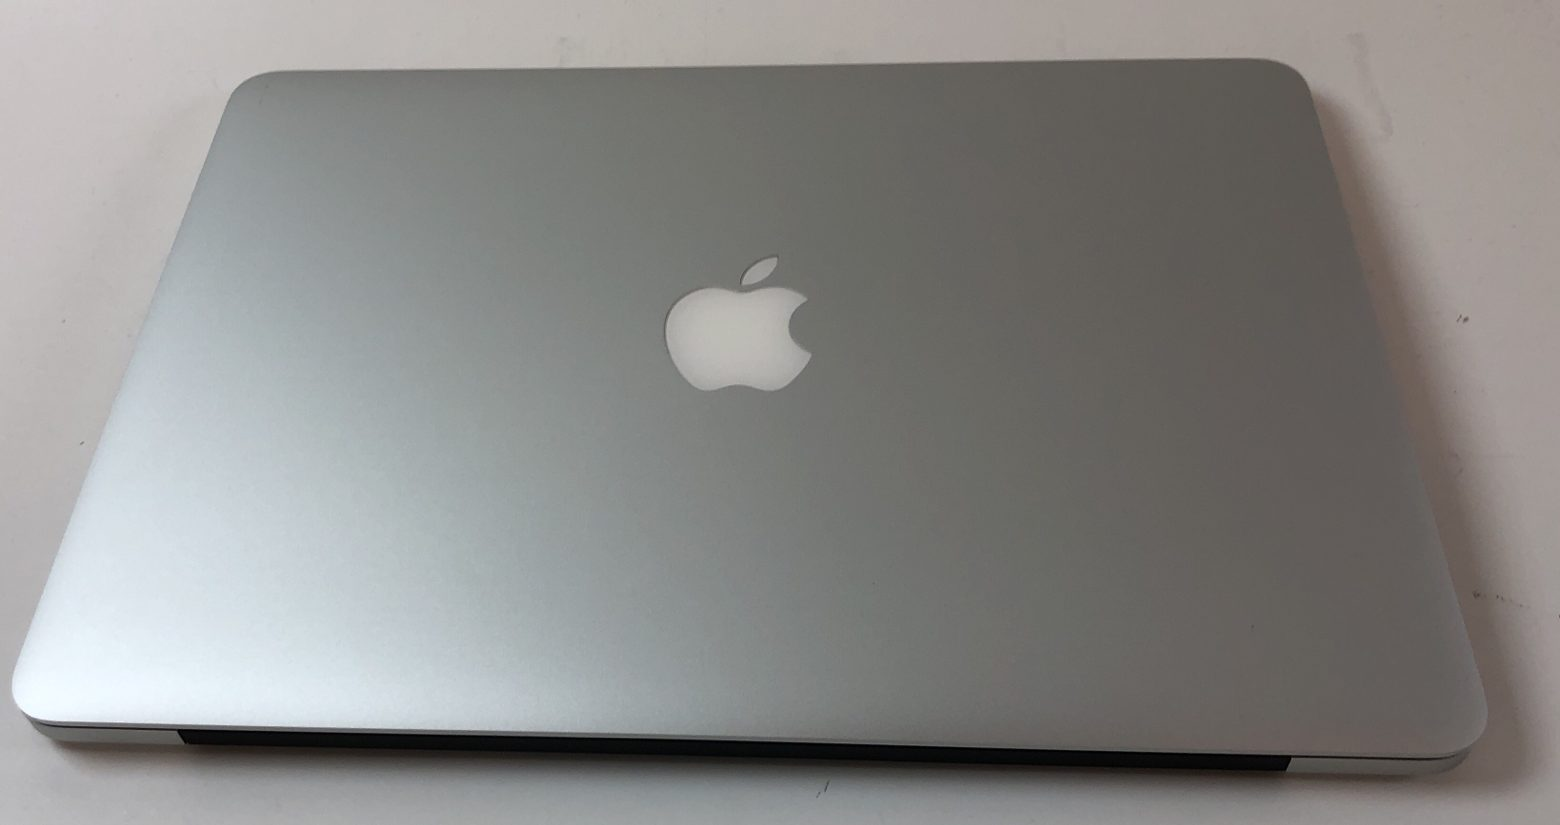 "MacBook Pro Retina 13"" Early 2015 (Intel Core i5 2.9 GHz 16 GB RAM 1 TB SSD), Intel Core i5 2.9 GHz, 16 GB RAM, 1 TB SSD, image 2"